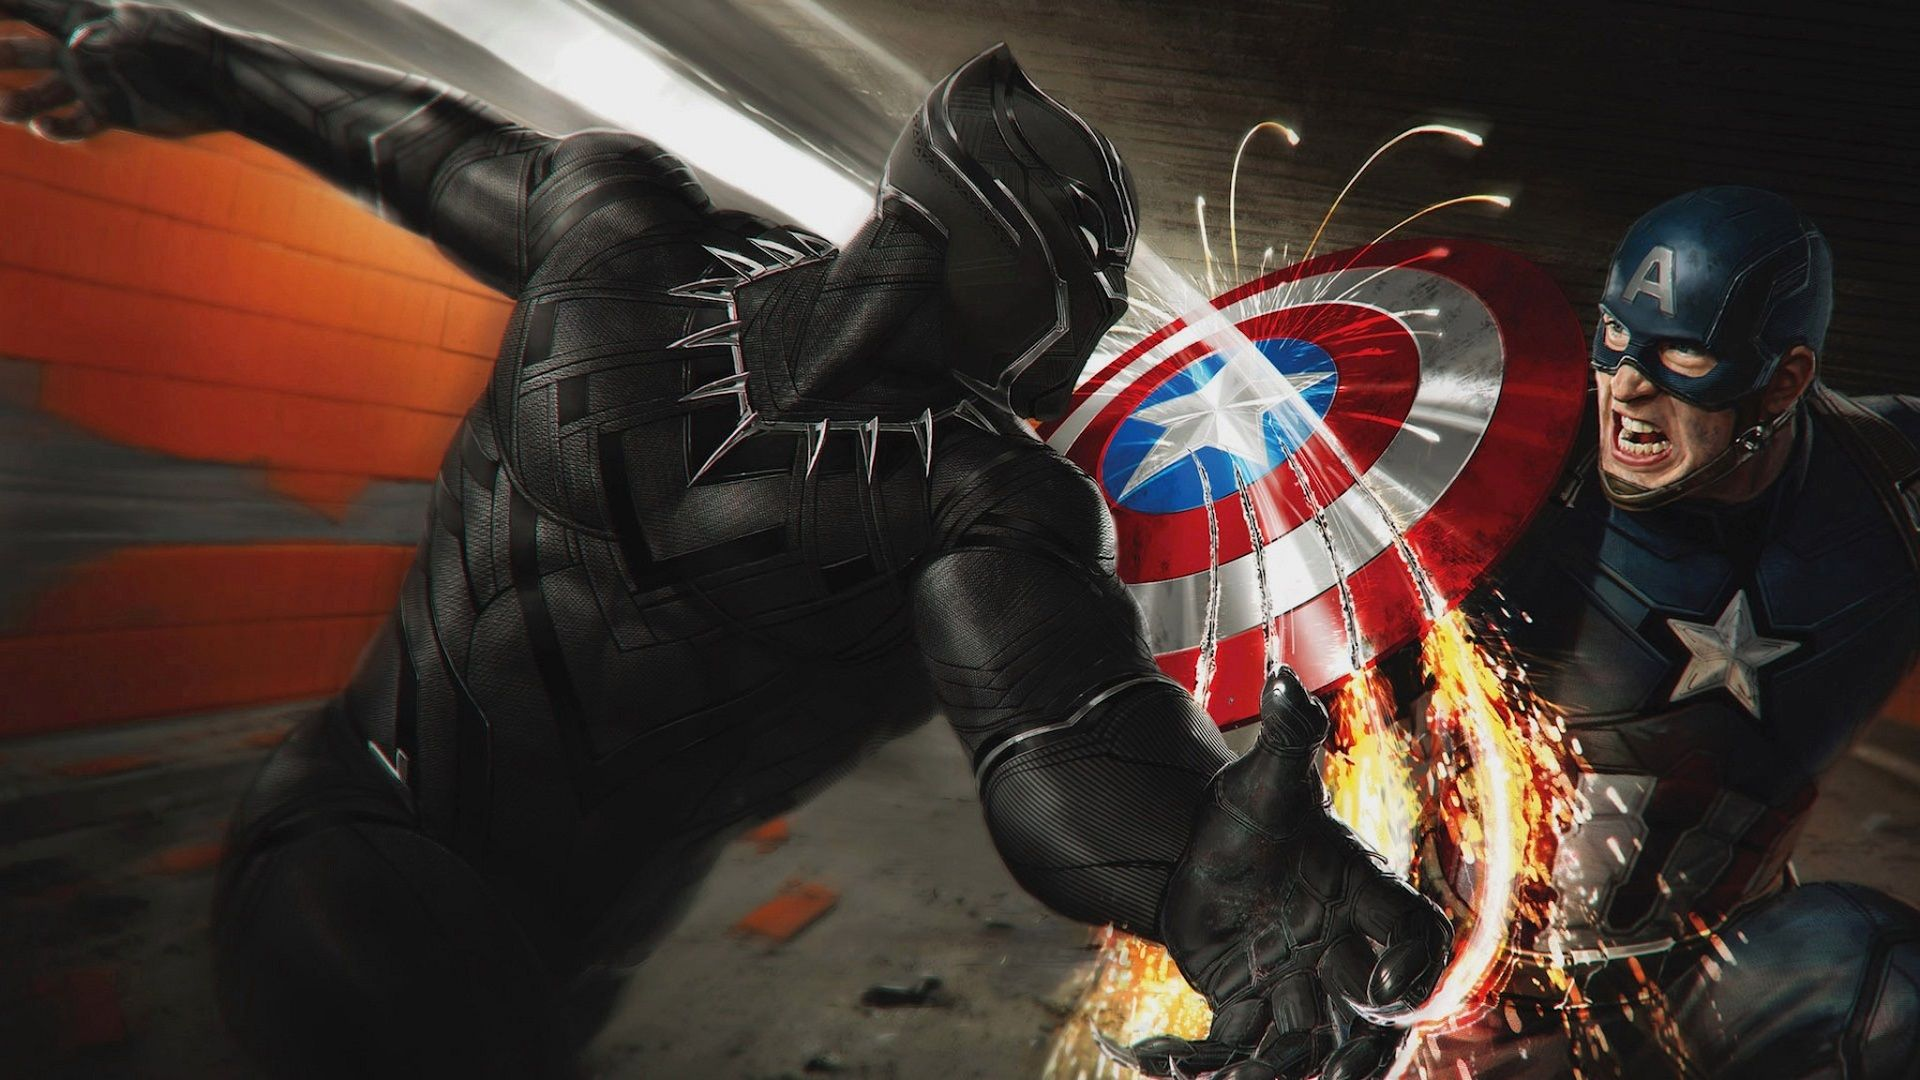 General 1920x1080 Captain America Black Panther Marvel Cinematic Universe Marvel Comics Artwo Black Panther Hd Wallpaper Captain America Captain America Poster